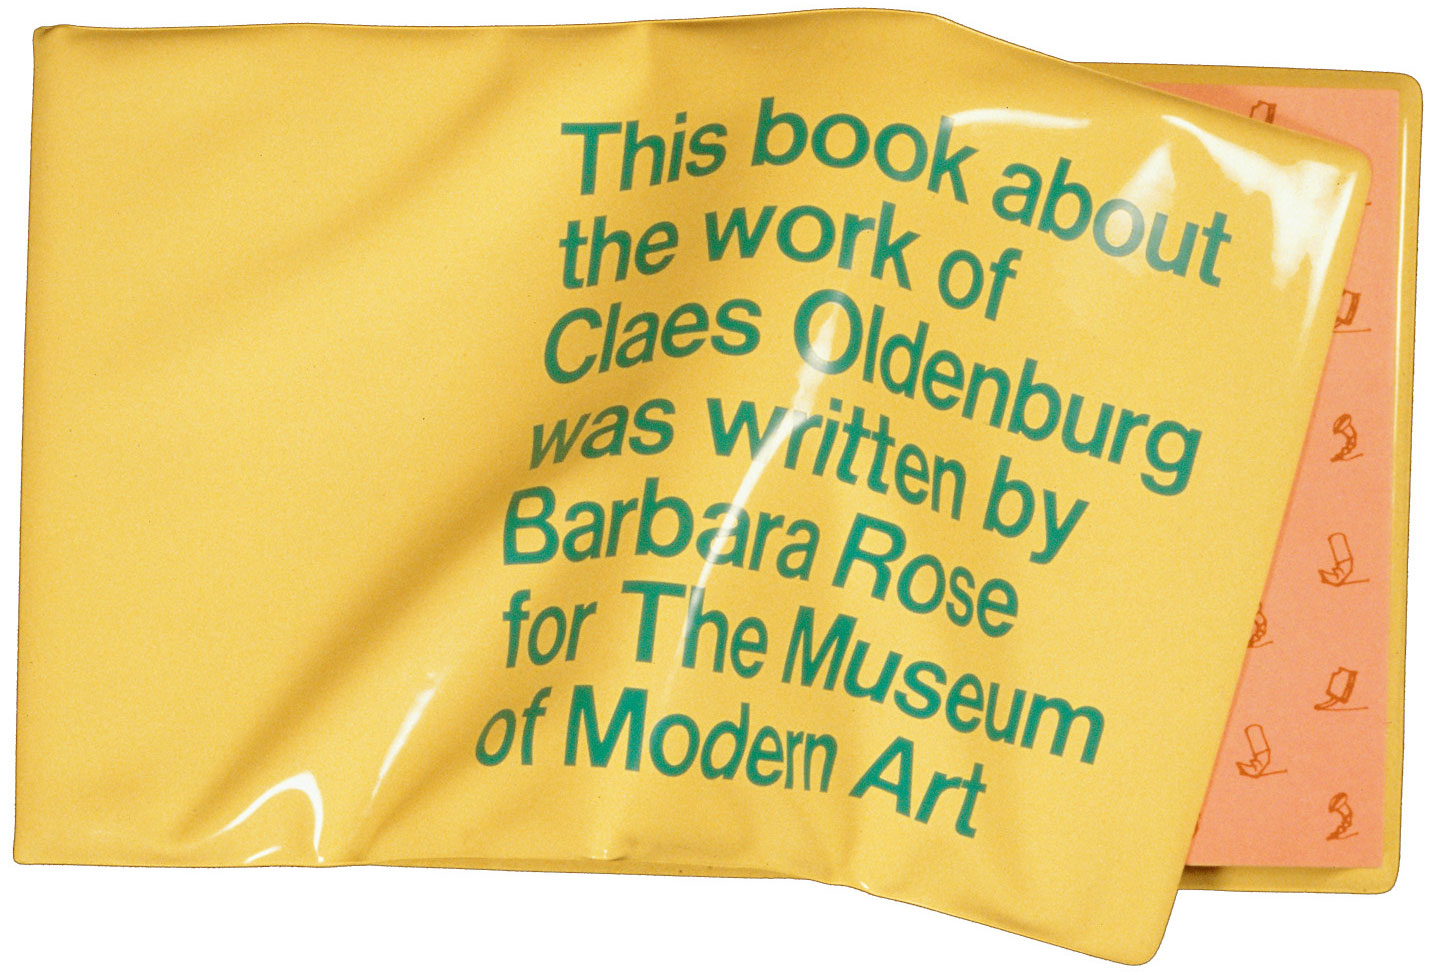 Chermayeff-and-Geismar-Claes-Oldenburg-catalogue-1970